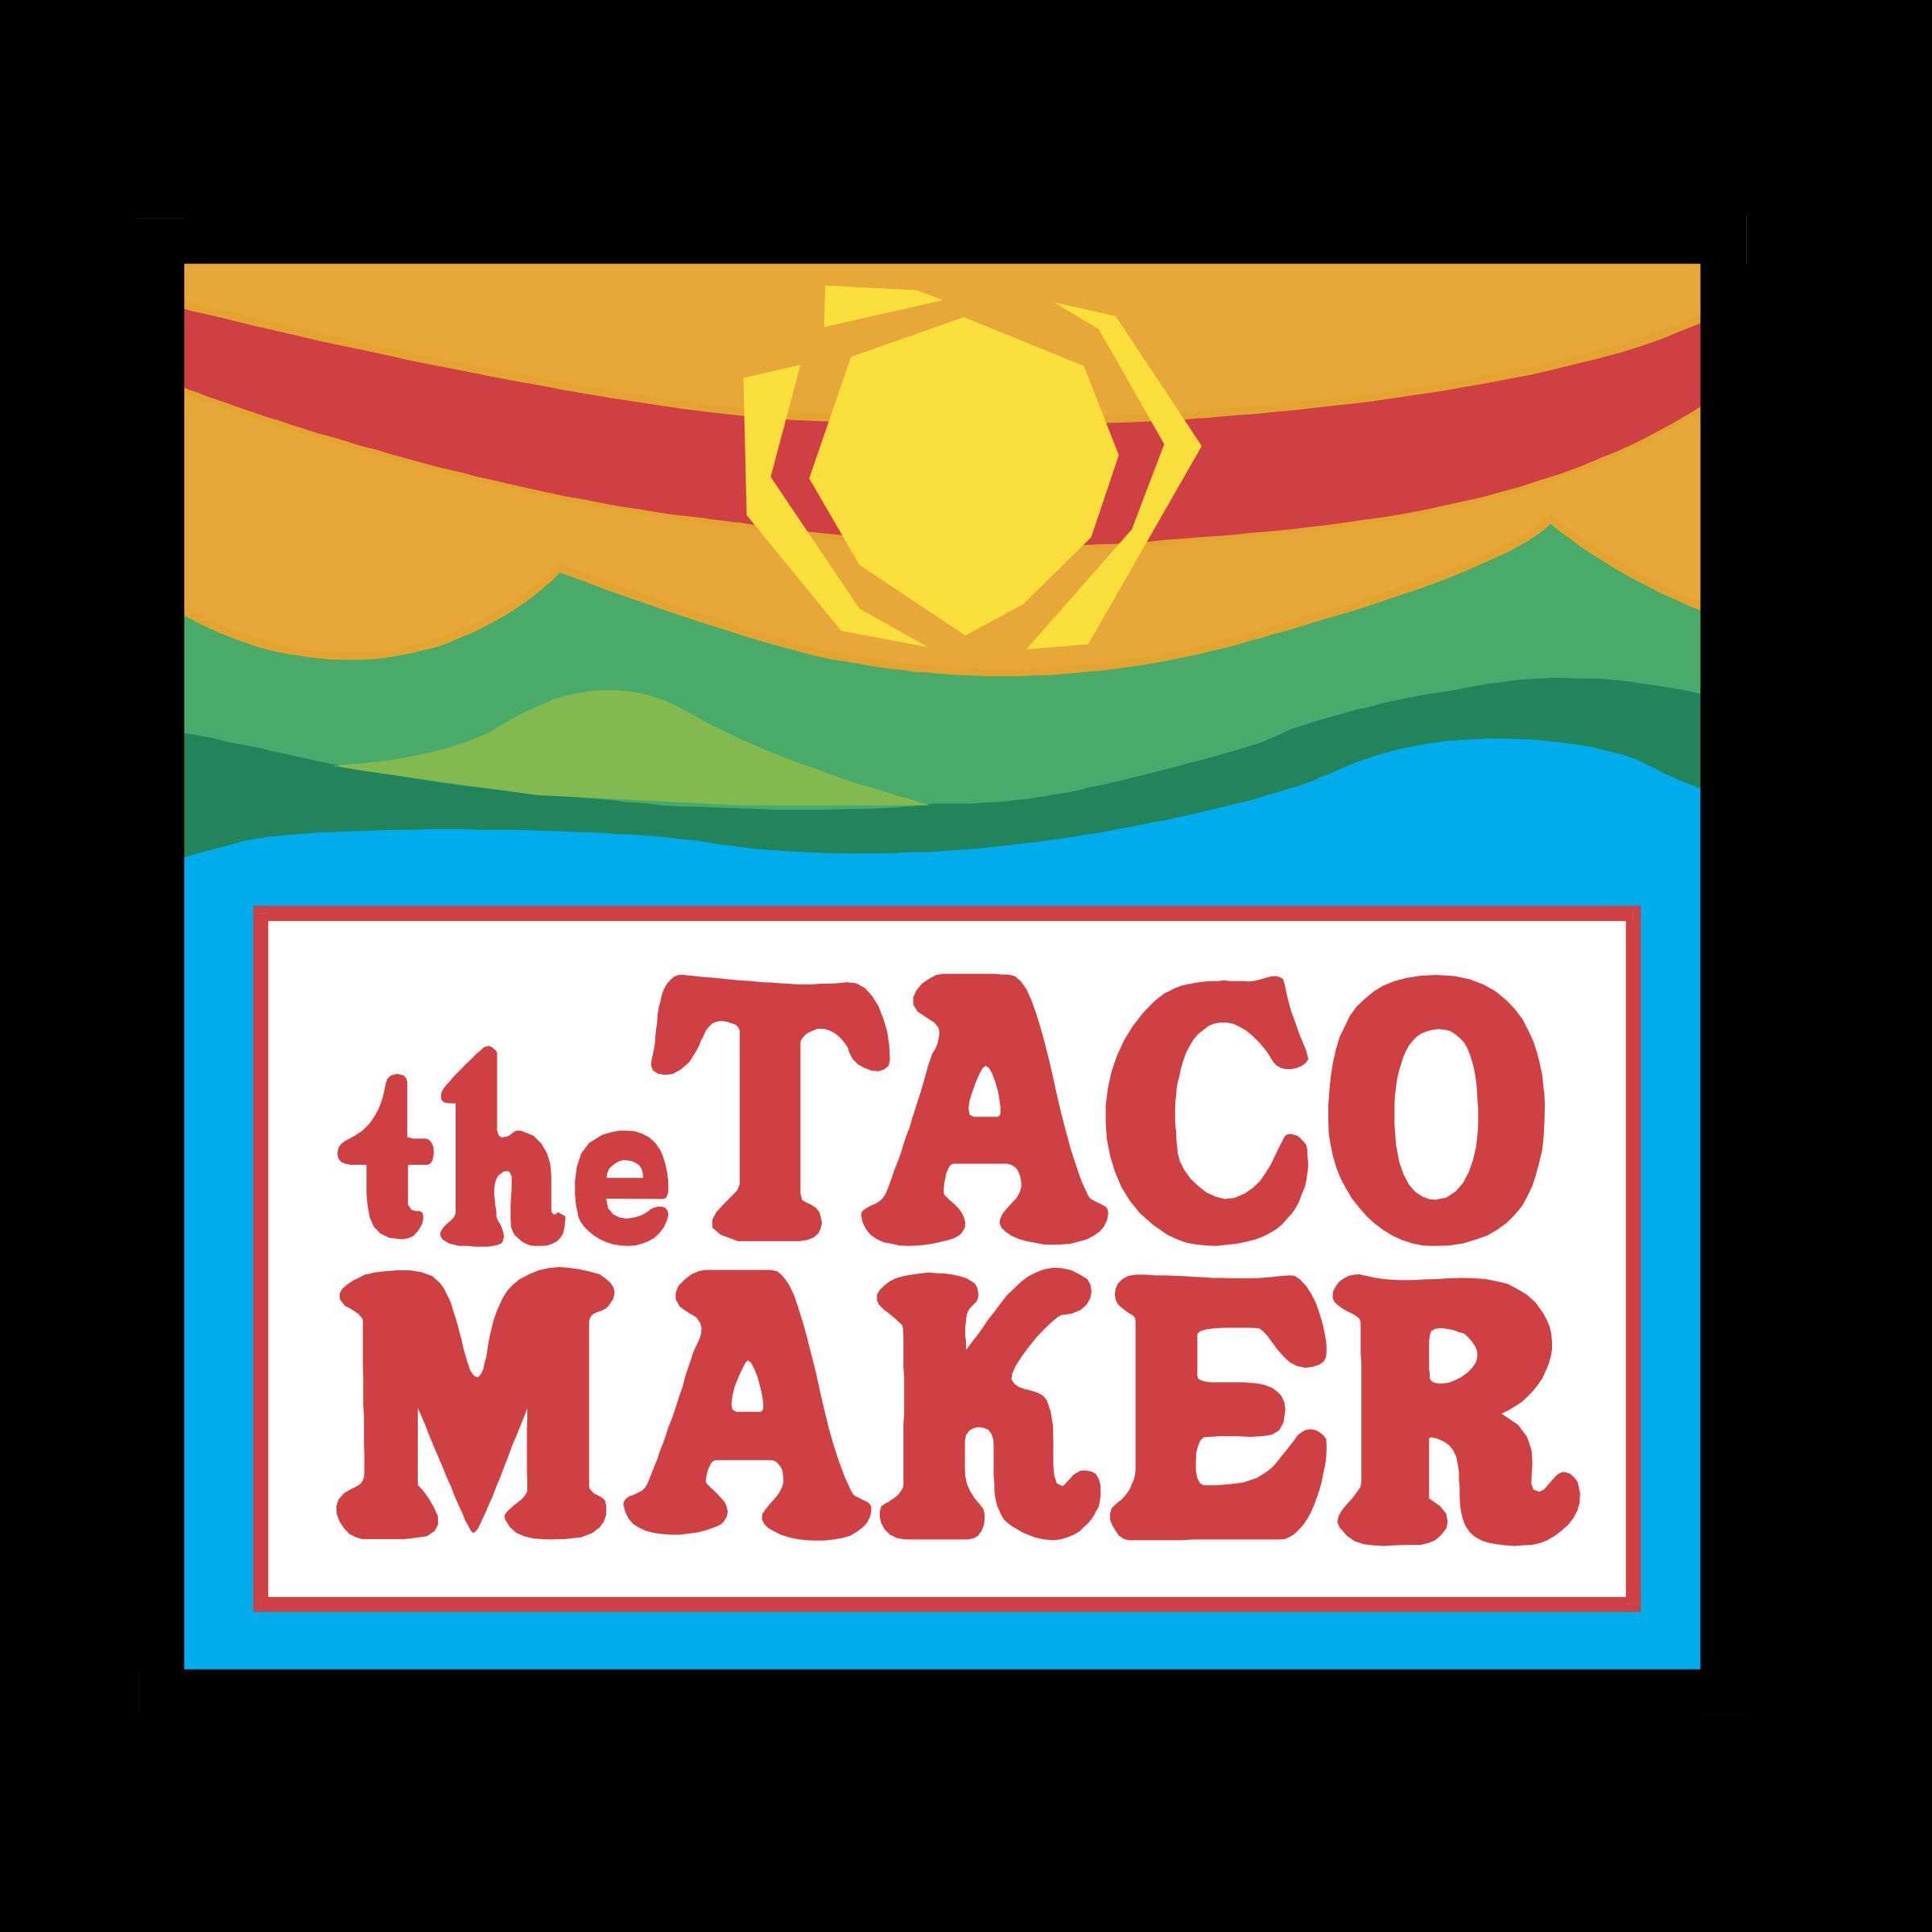 Tacos clipart vector. The taco maker logo